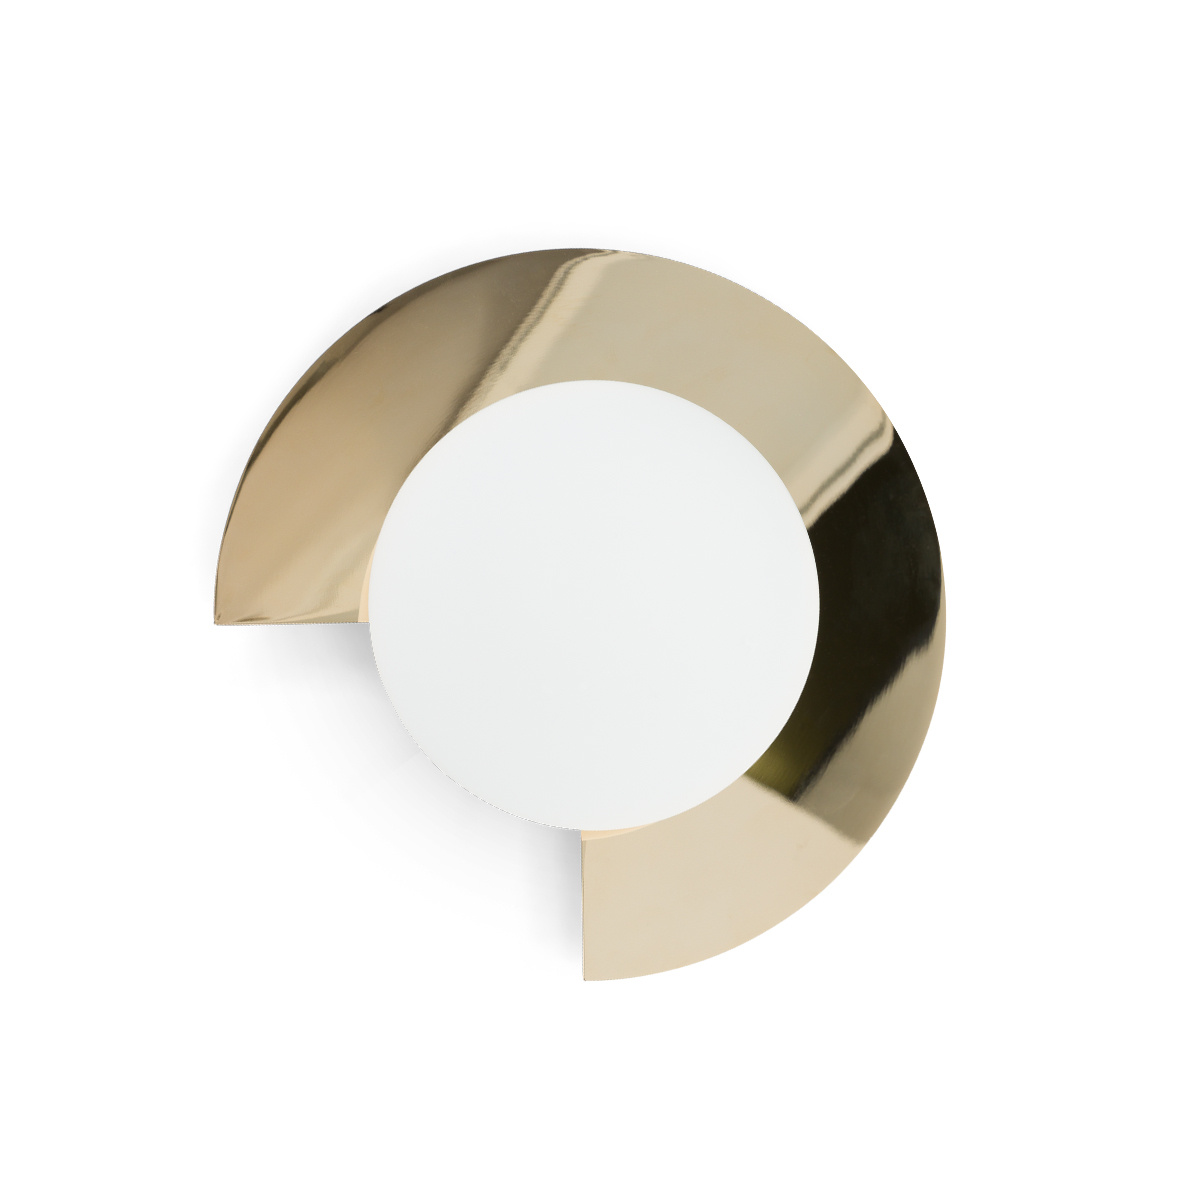 Small Mezza Luna Wall Lamp, Shiny Brass